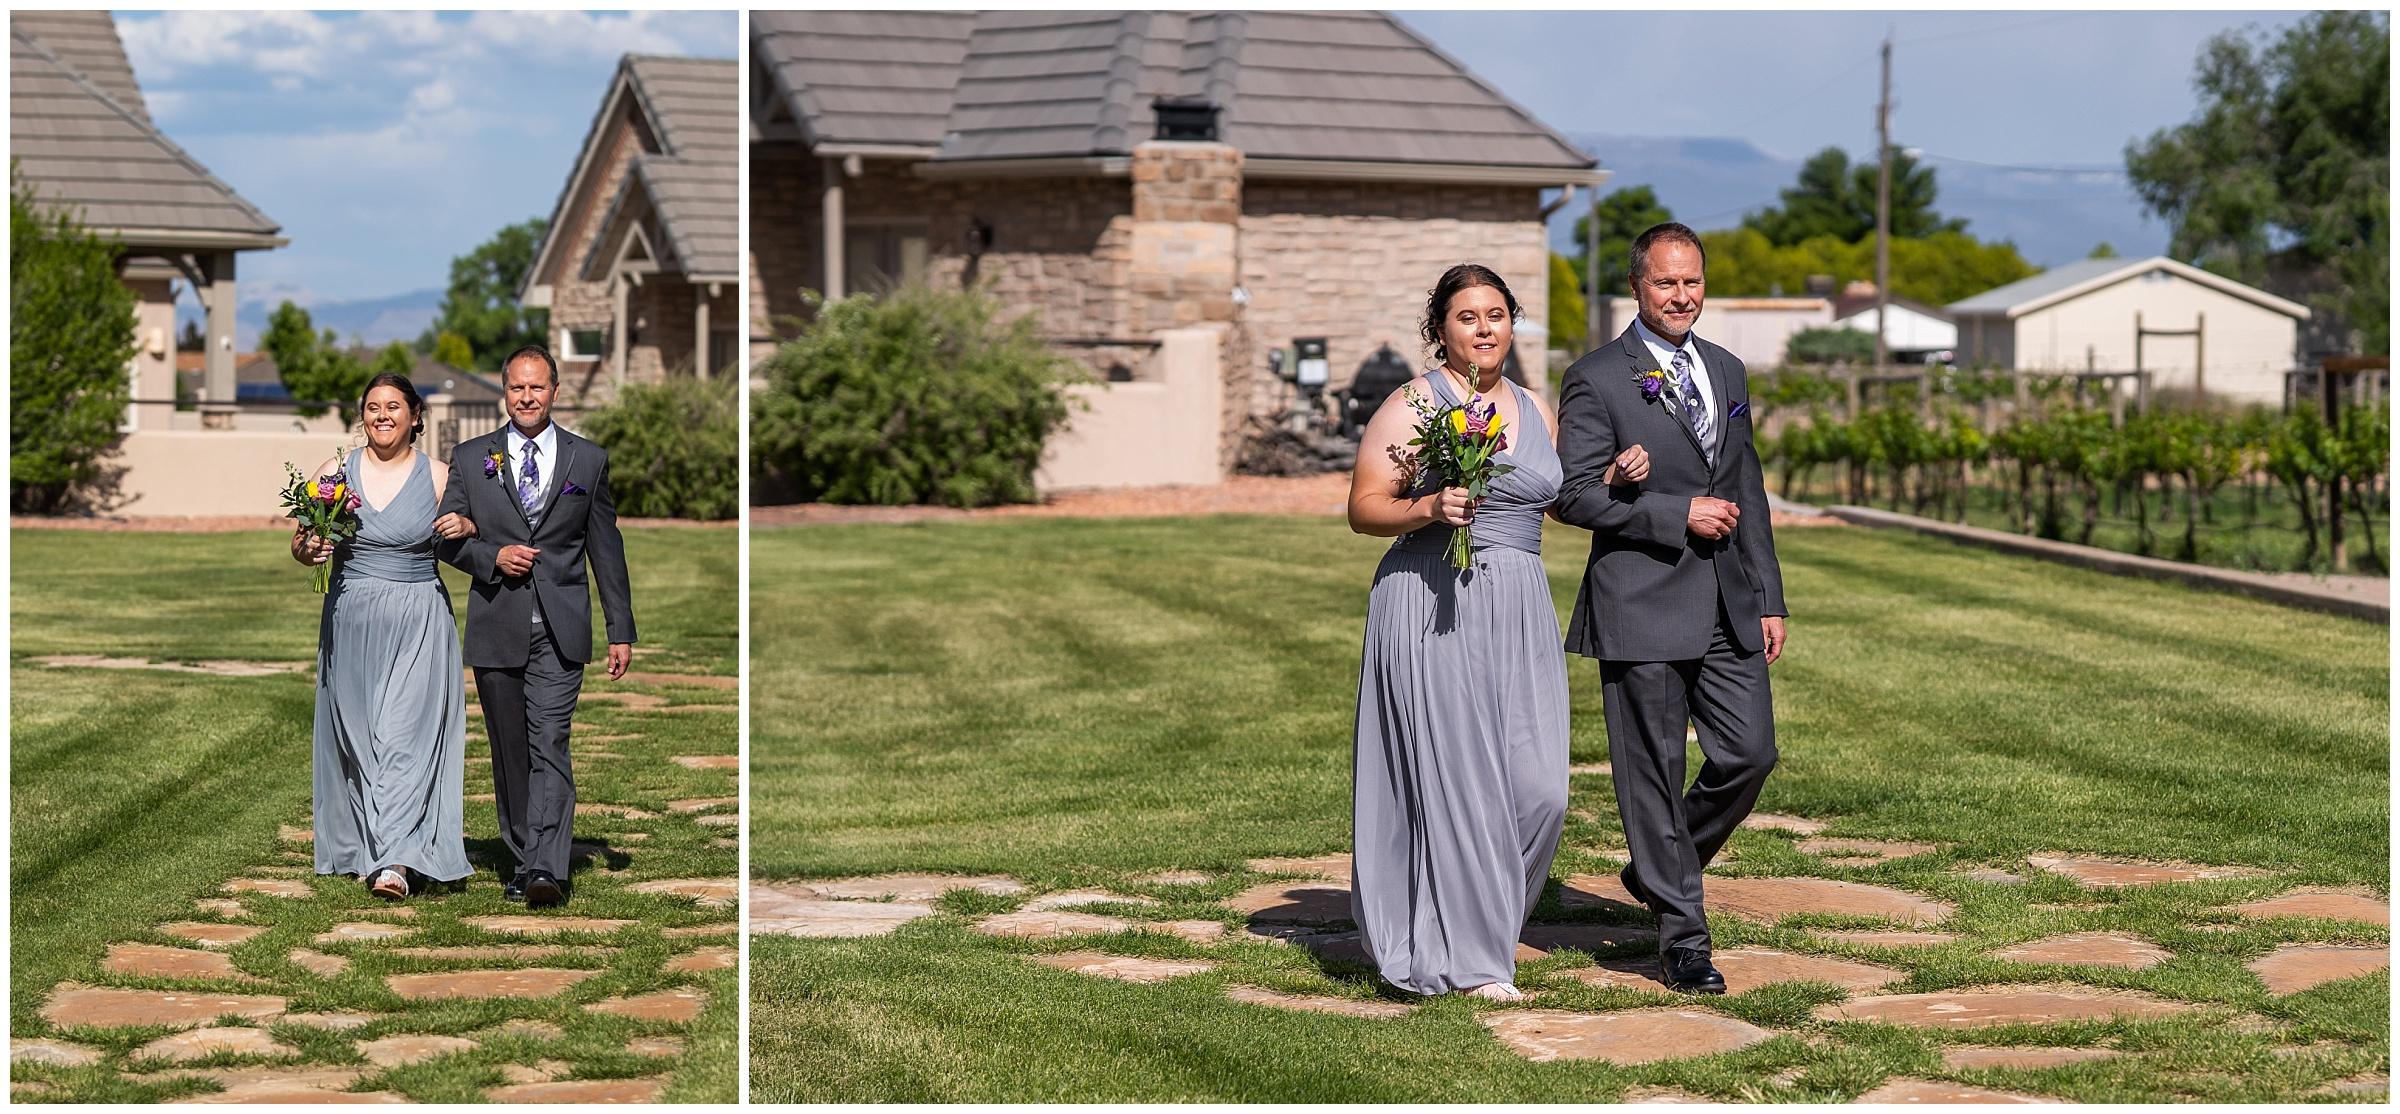 Grand Junction Wedding Photographer 0034.jpg